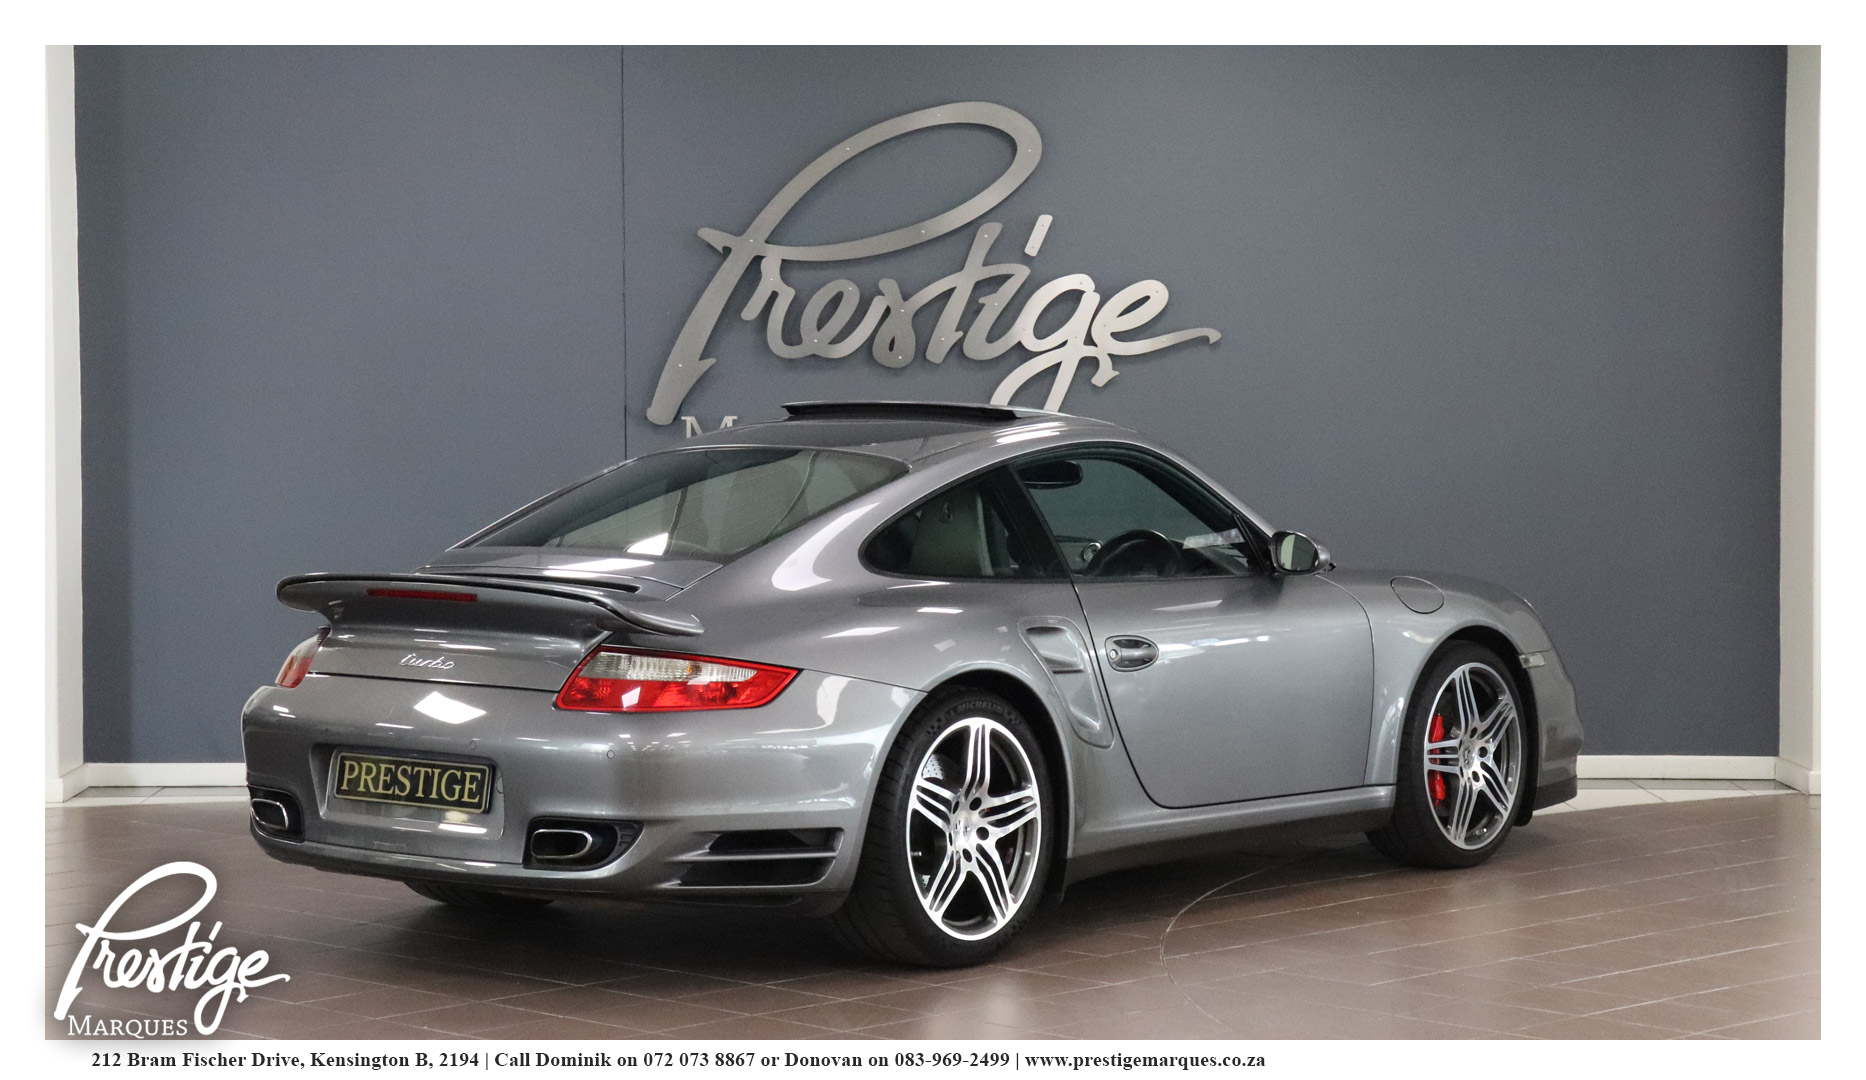 2008-Porsche-911-997-Turbo-Tiptronic-Prestige-Marques-Randburg-Sandton-3